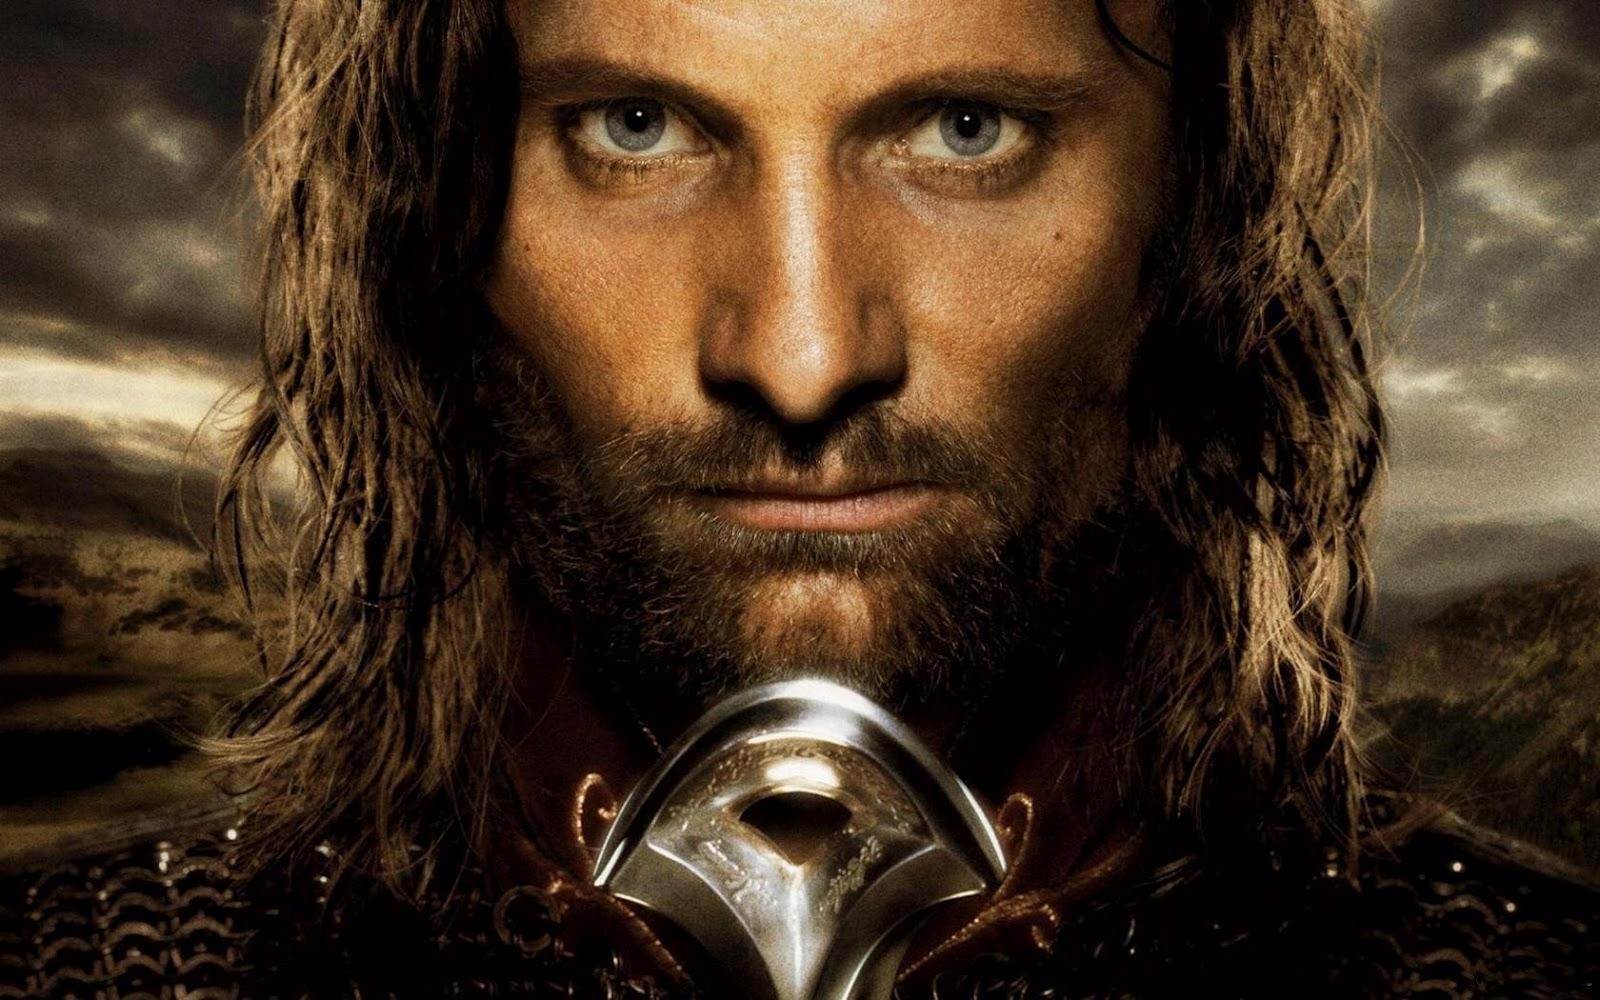 http://2.bp.blogspot.com/-z0YSUZw9eXU/UFD4LObA8qI/AAAAAAAAHhQ/CvrPjSXDf_Q/s1600/anti-flag-aragorn-movie-the-lord-of-rings-viggo-mortensen-364475.jpg